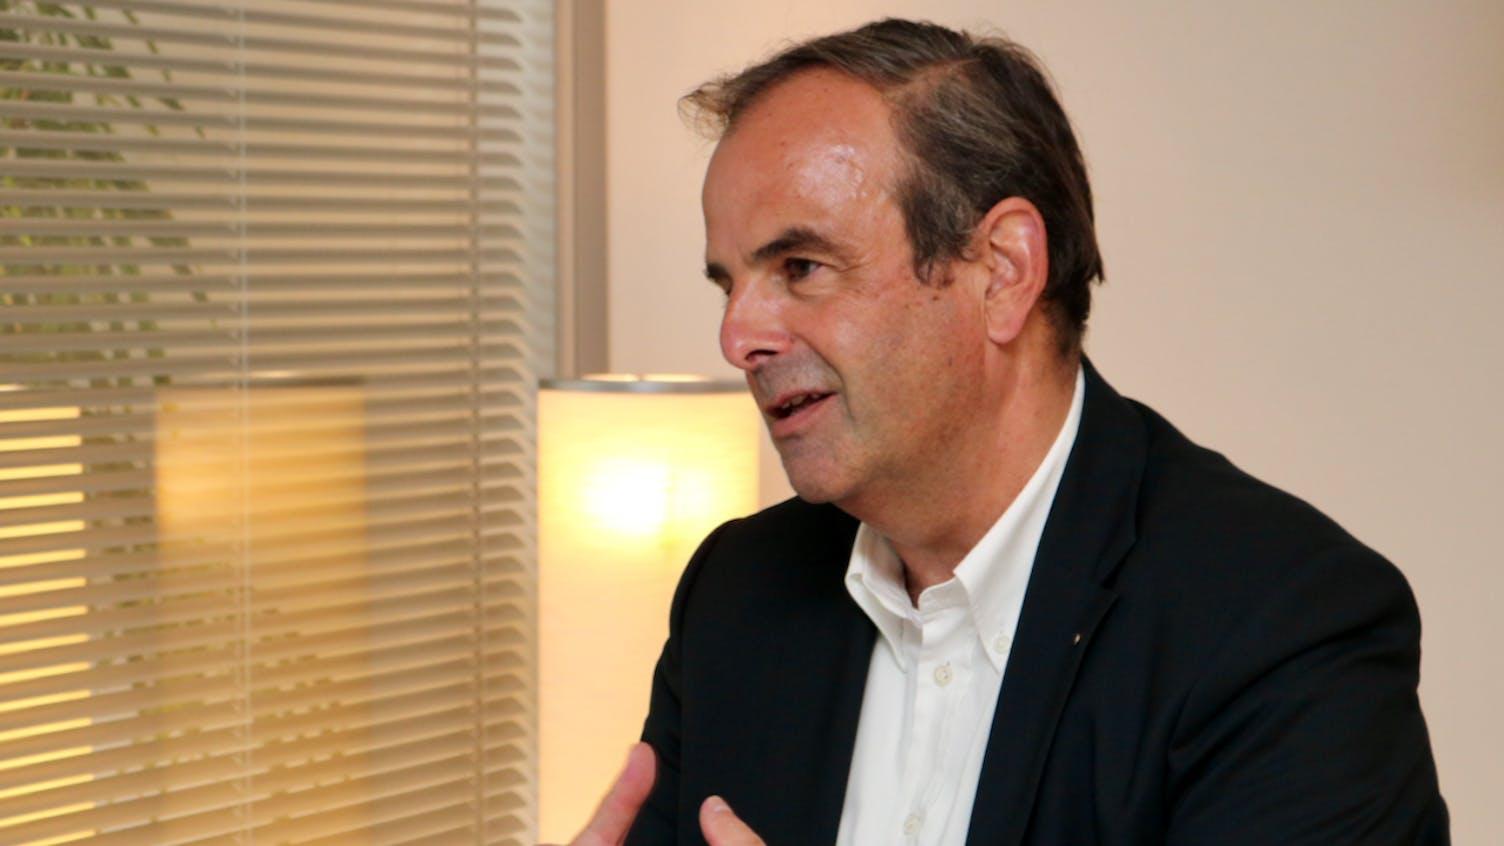 Gerhard Pfister